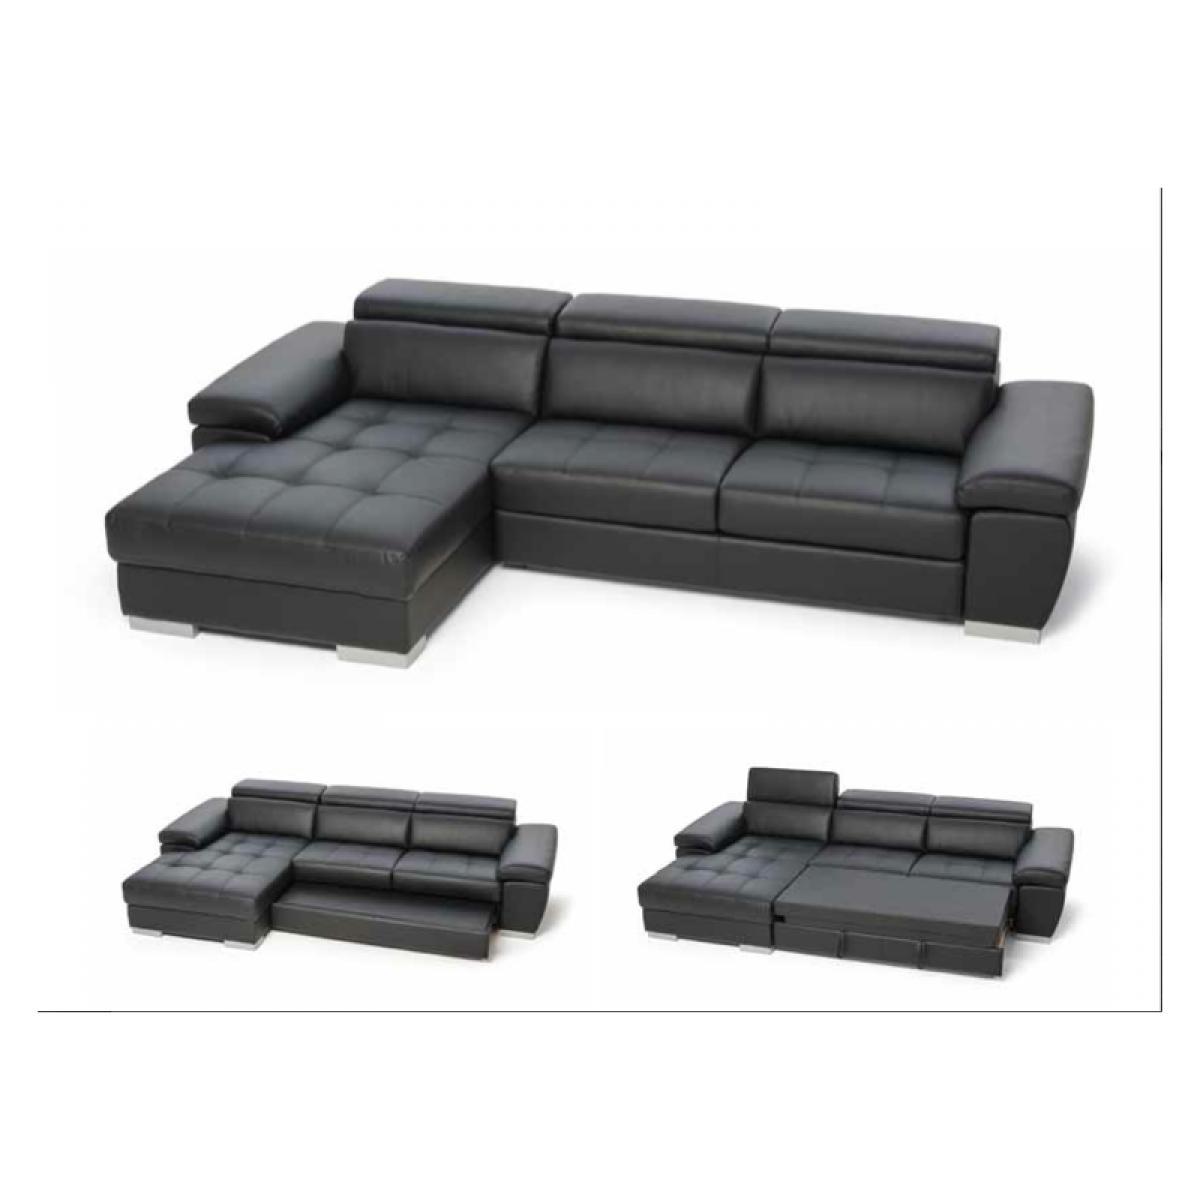 photos canap d 39 angle convertible design simon. Black Bedroom Furniture Sets. Home Design Ideas